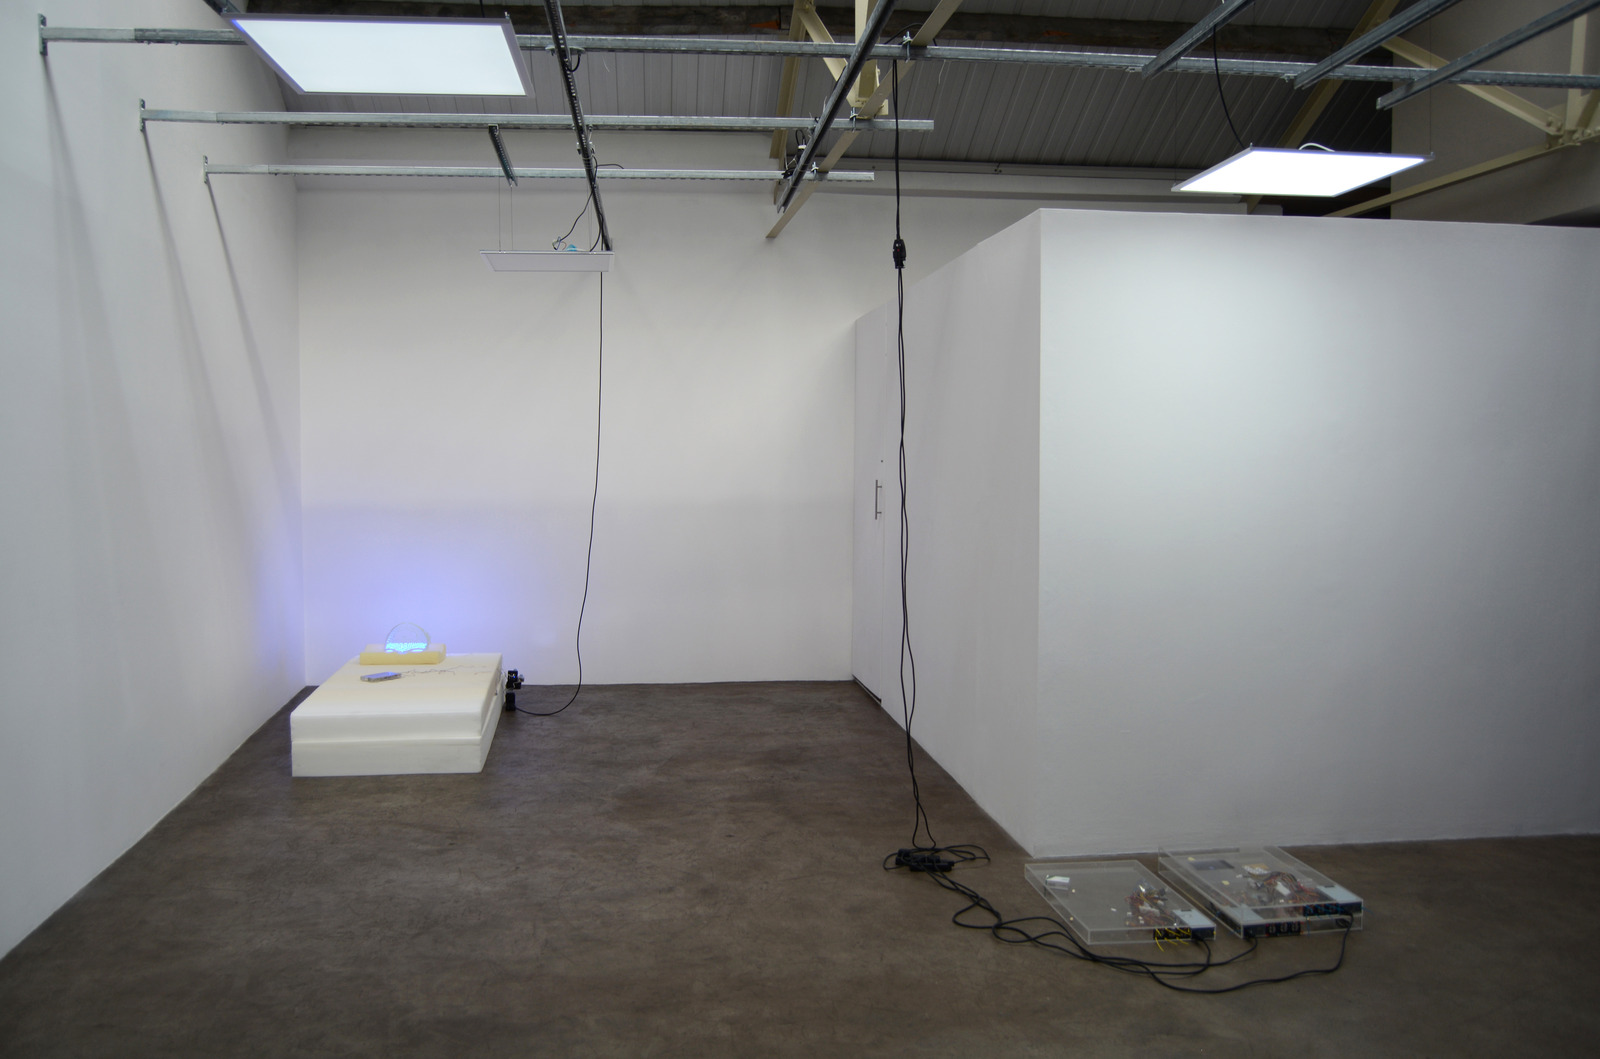 8. Yuri Pattison_sunset provision_installation view_memory foam remembers_dust,scraper, fan